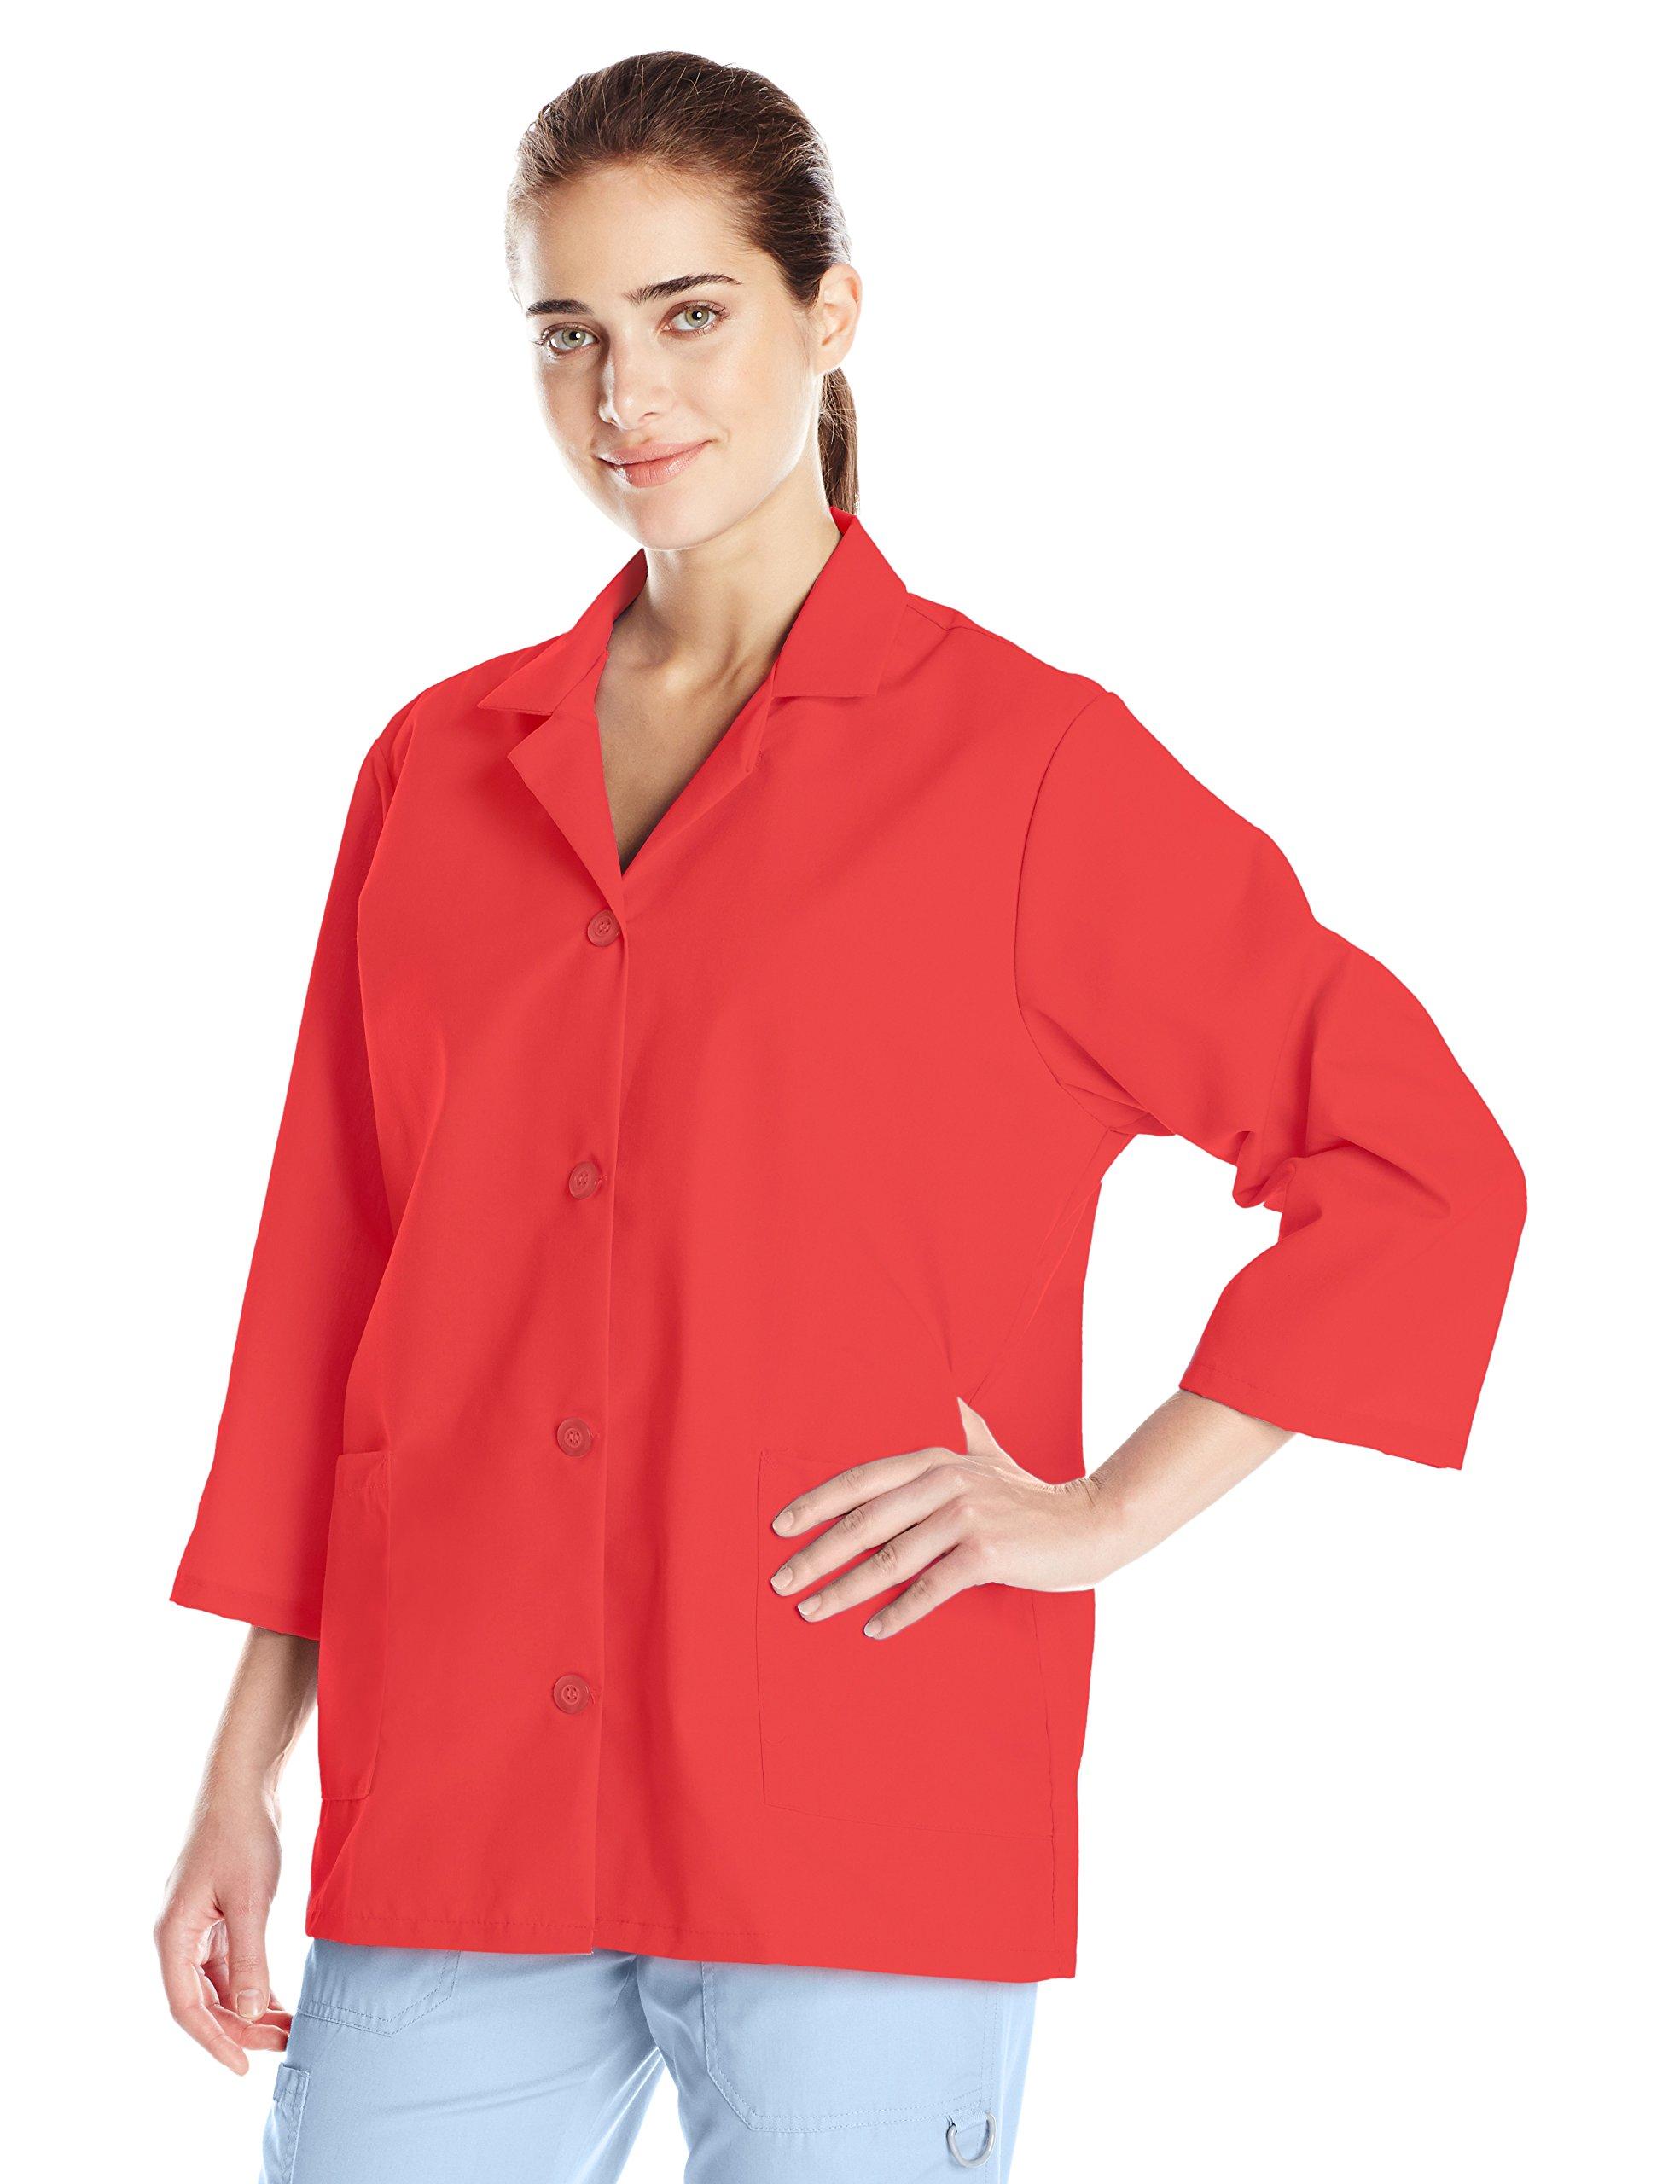 Red Kap Women's Plus Size 3/4 Sleeve Smock, Red, XX-Large